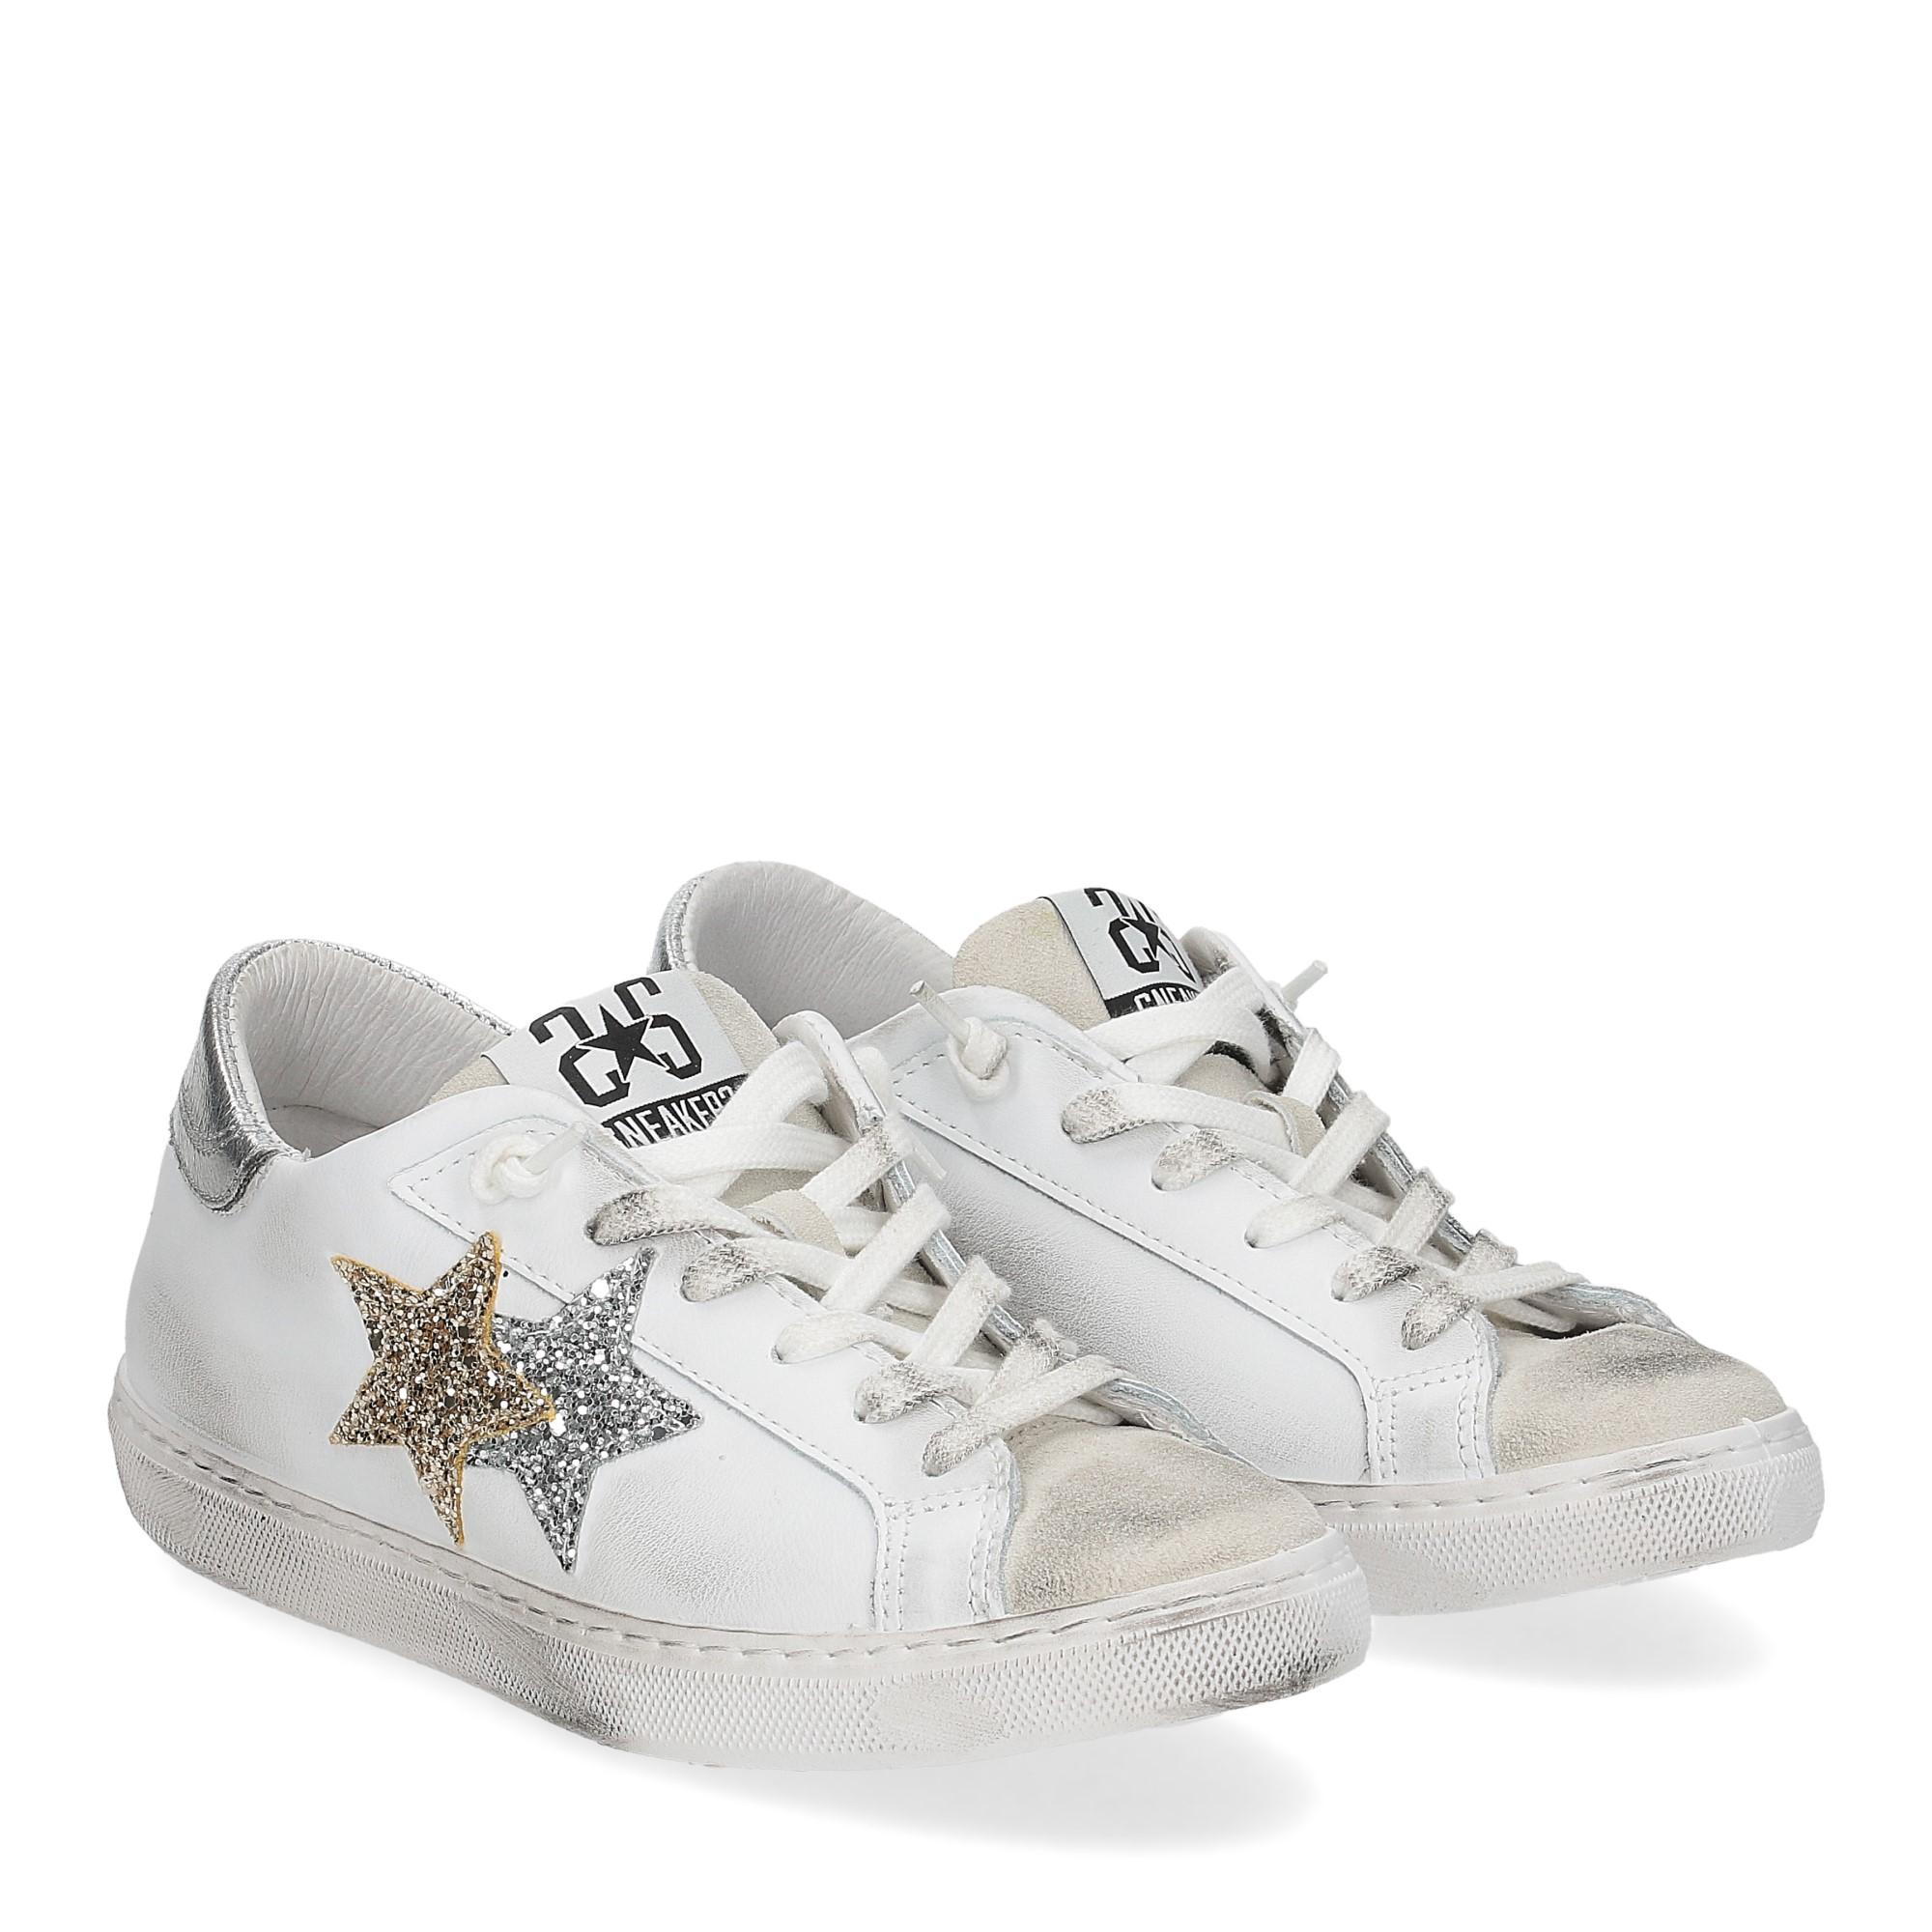 2Star 2817 sneaker bianco glitter oro